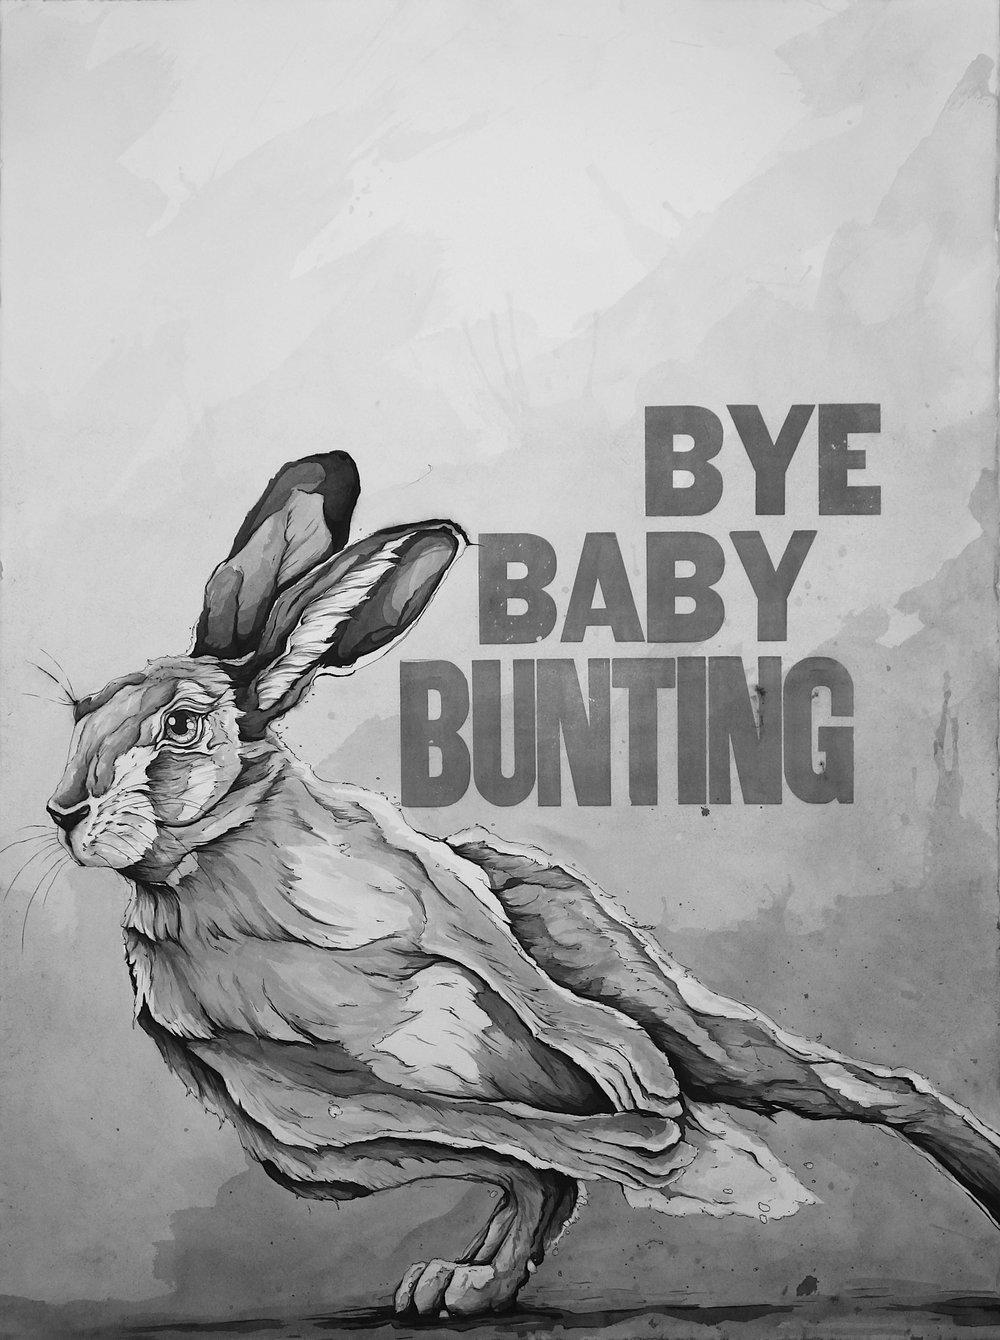 1Bye Baby Bunting.JPG